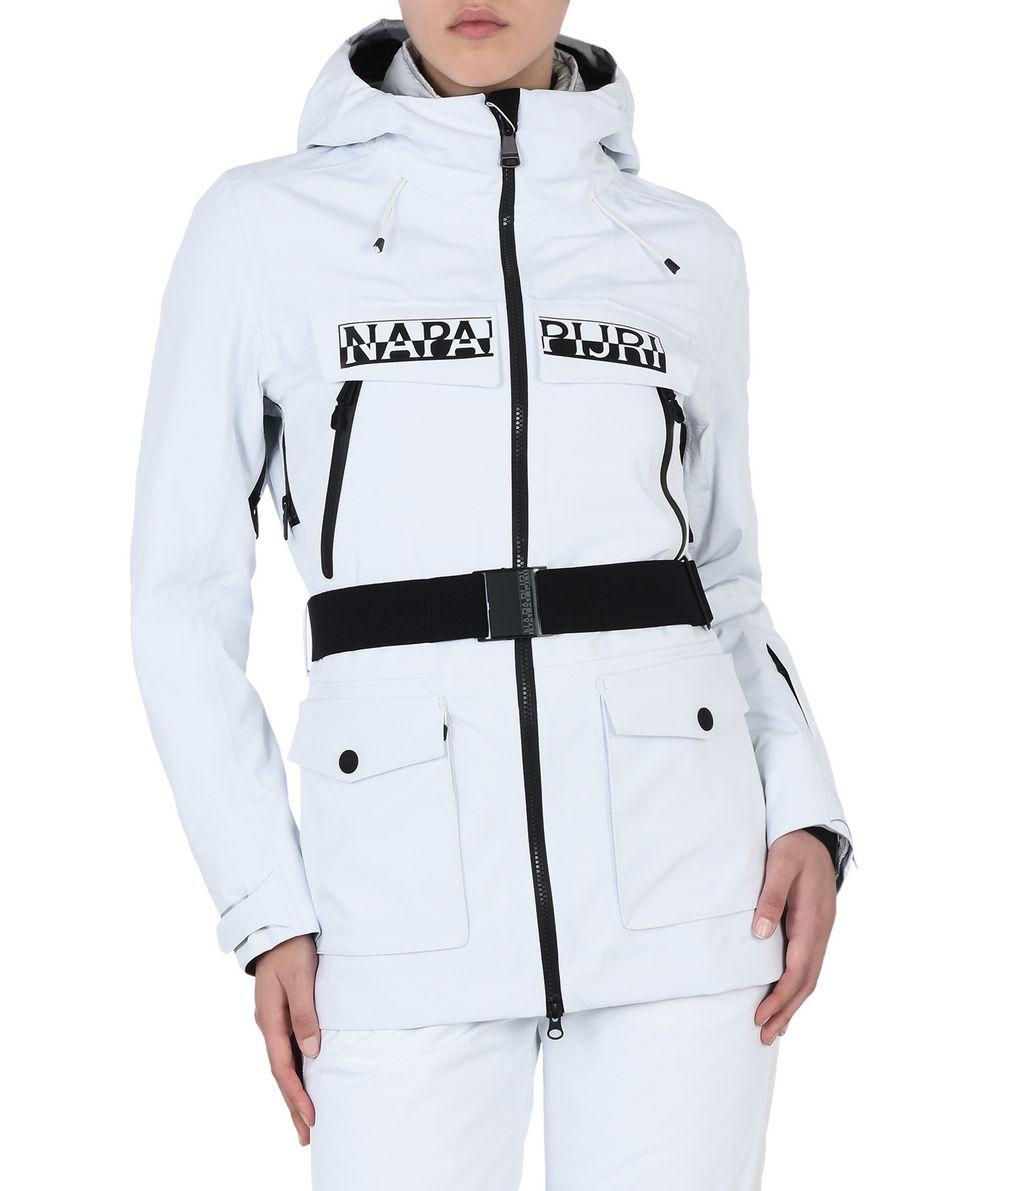 Femme Ski Vetement Napapijri Blouson Rrqd6ftw1 Yerevan OSqAaO